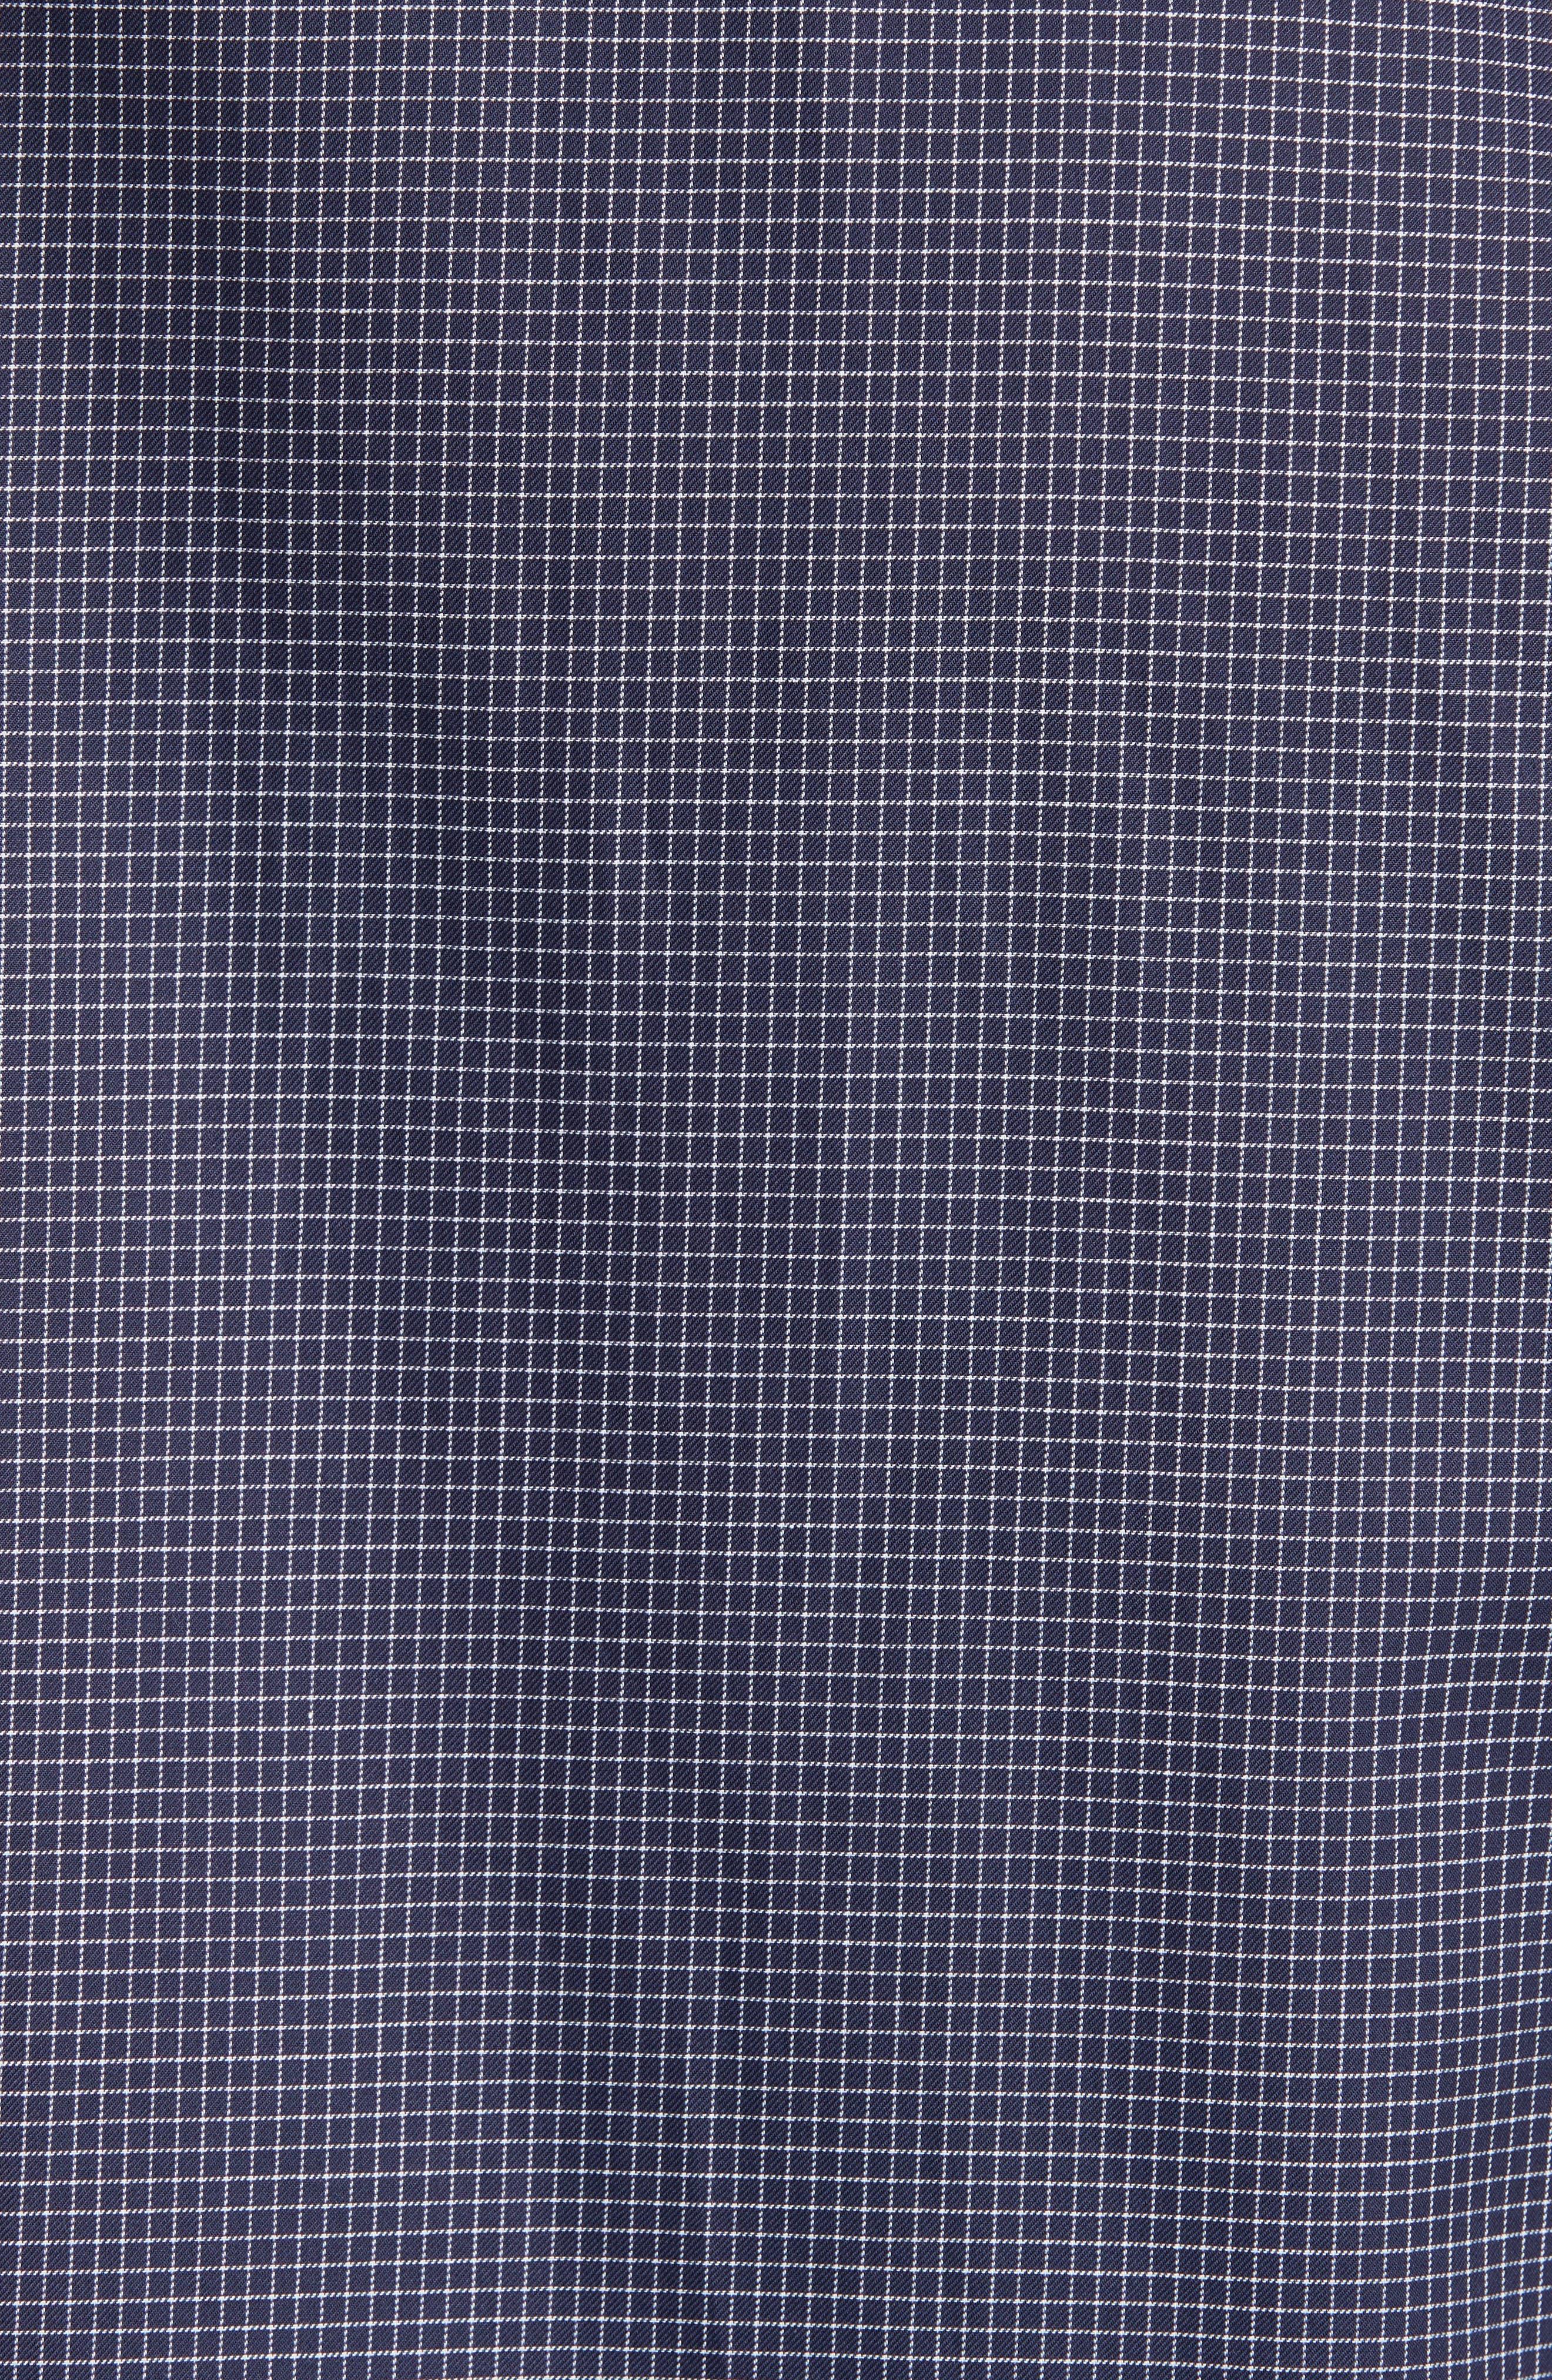 Alternate Image 5  - Armani Collezioni Slim Fit Grid Print Sport Shirt